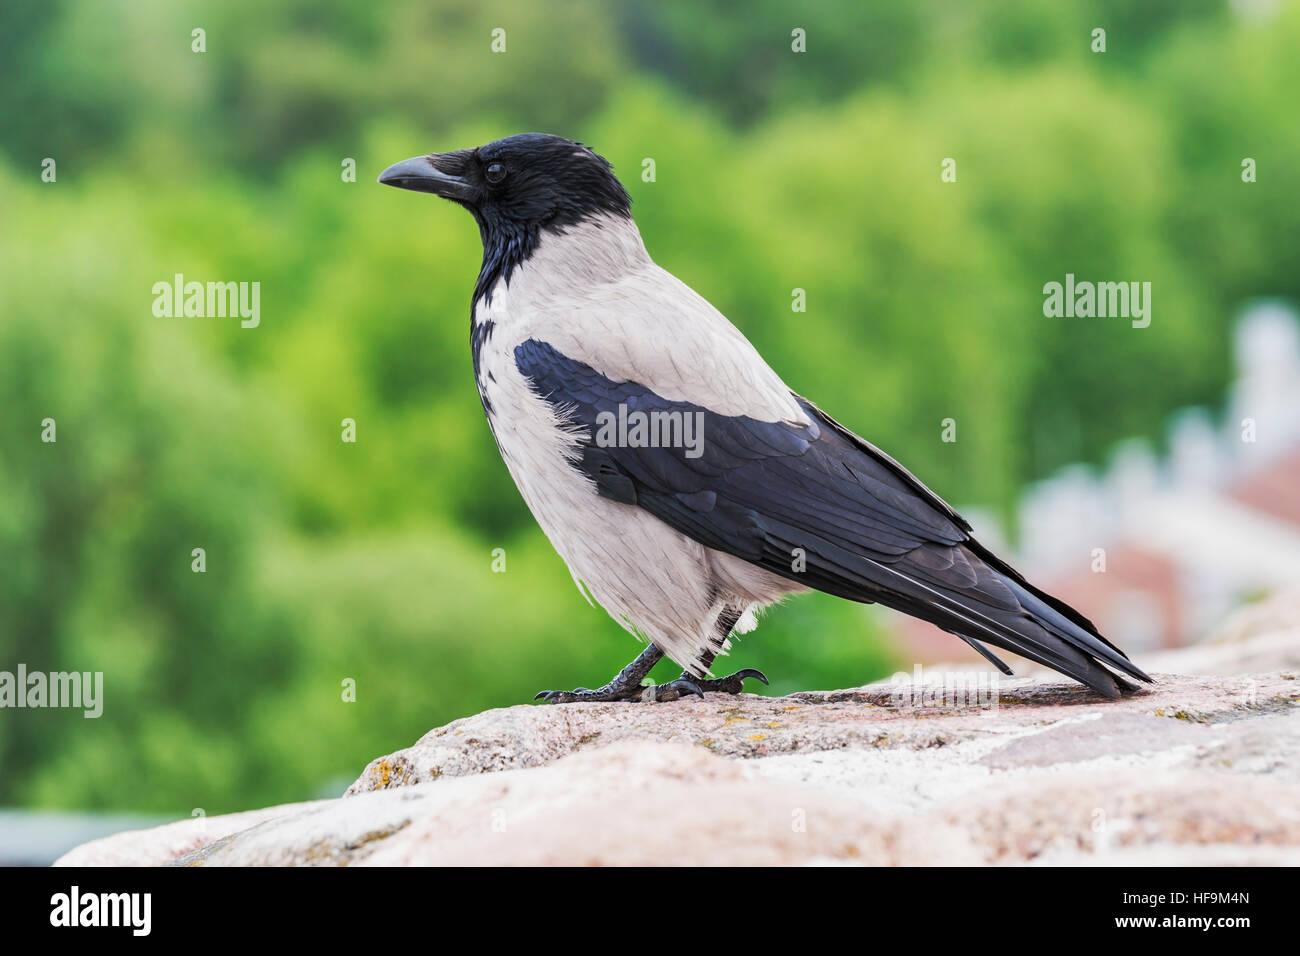 Closeup view of a dun crow, Corvus corone - Stock Image